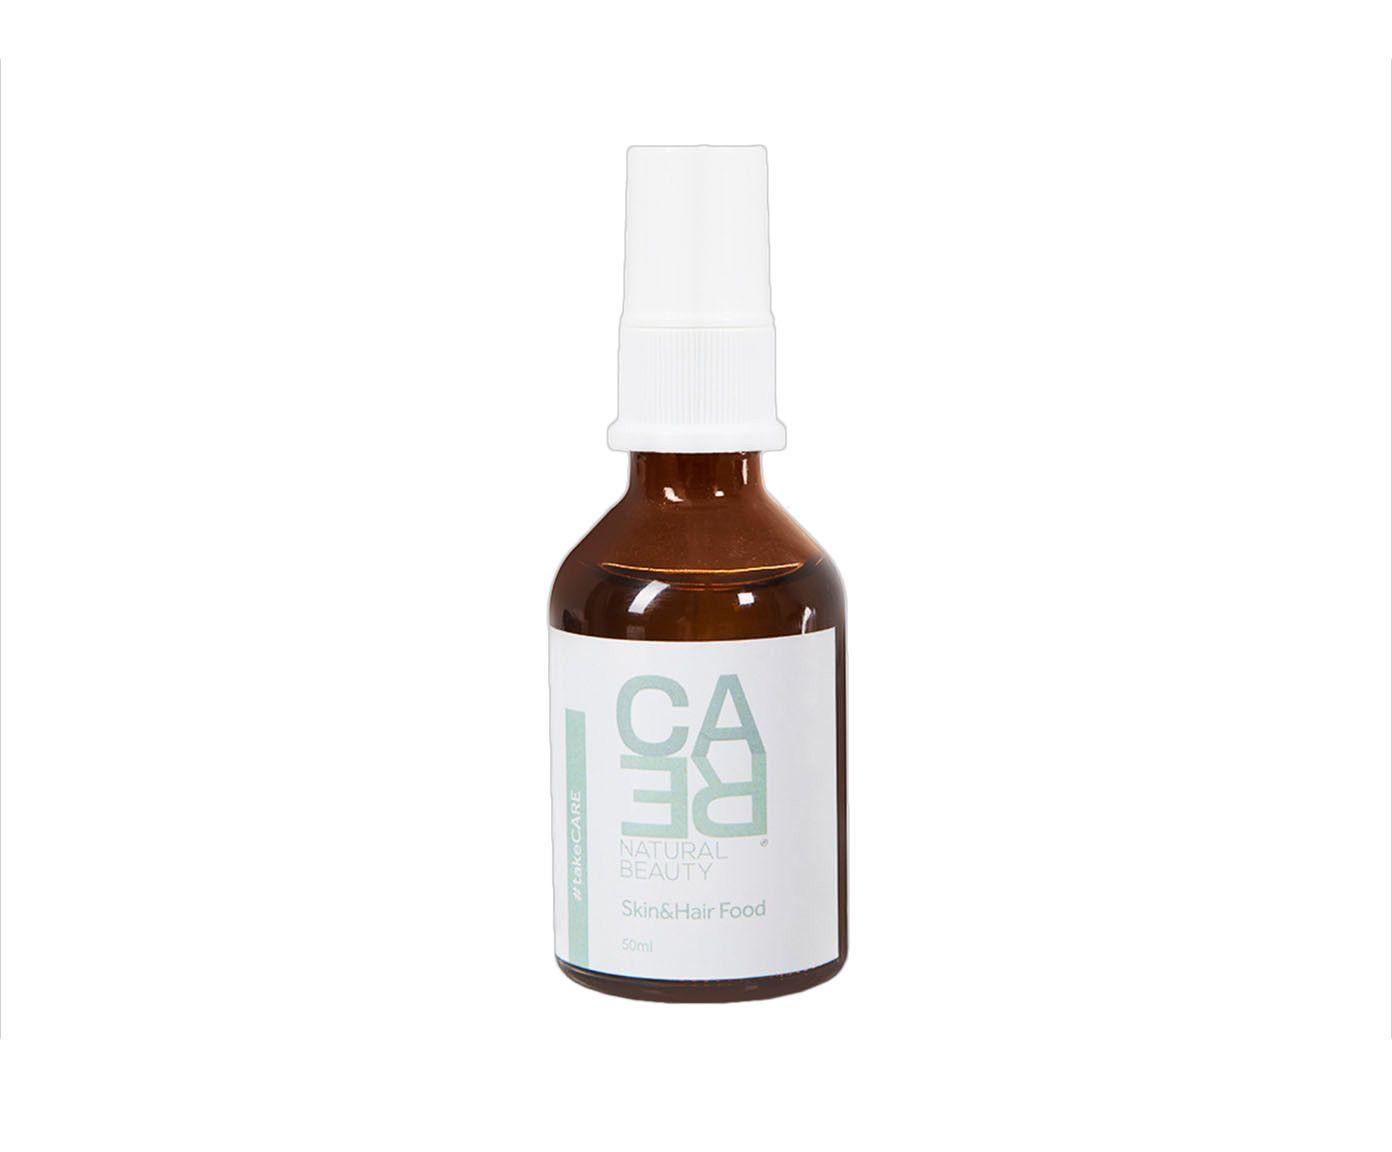 Água Termal Natural Hidratante, Tonificante Skin&Hair Food - 50ml | Westwing.com.br